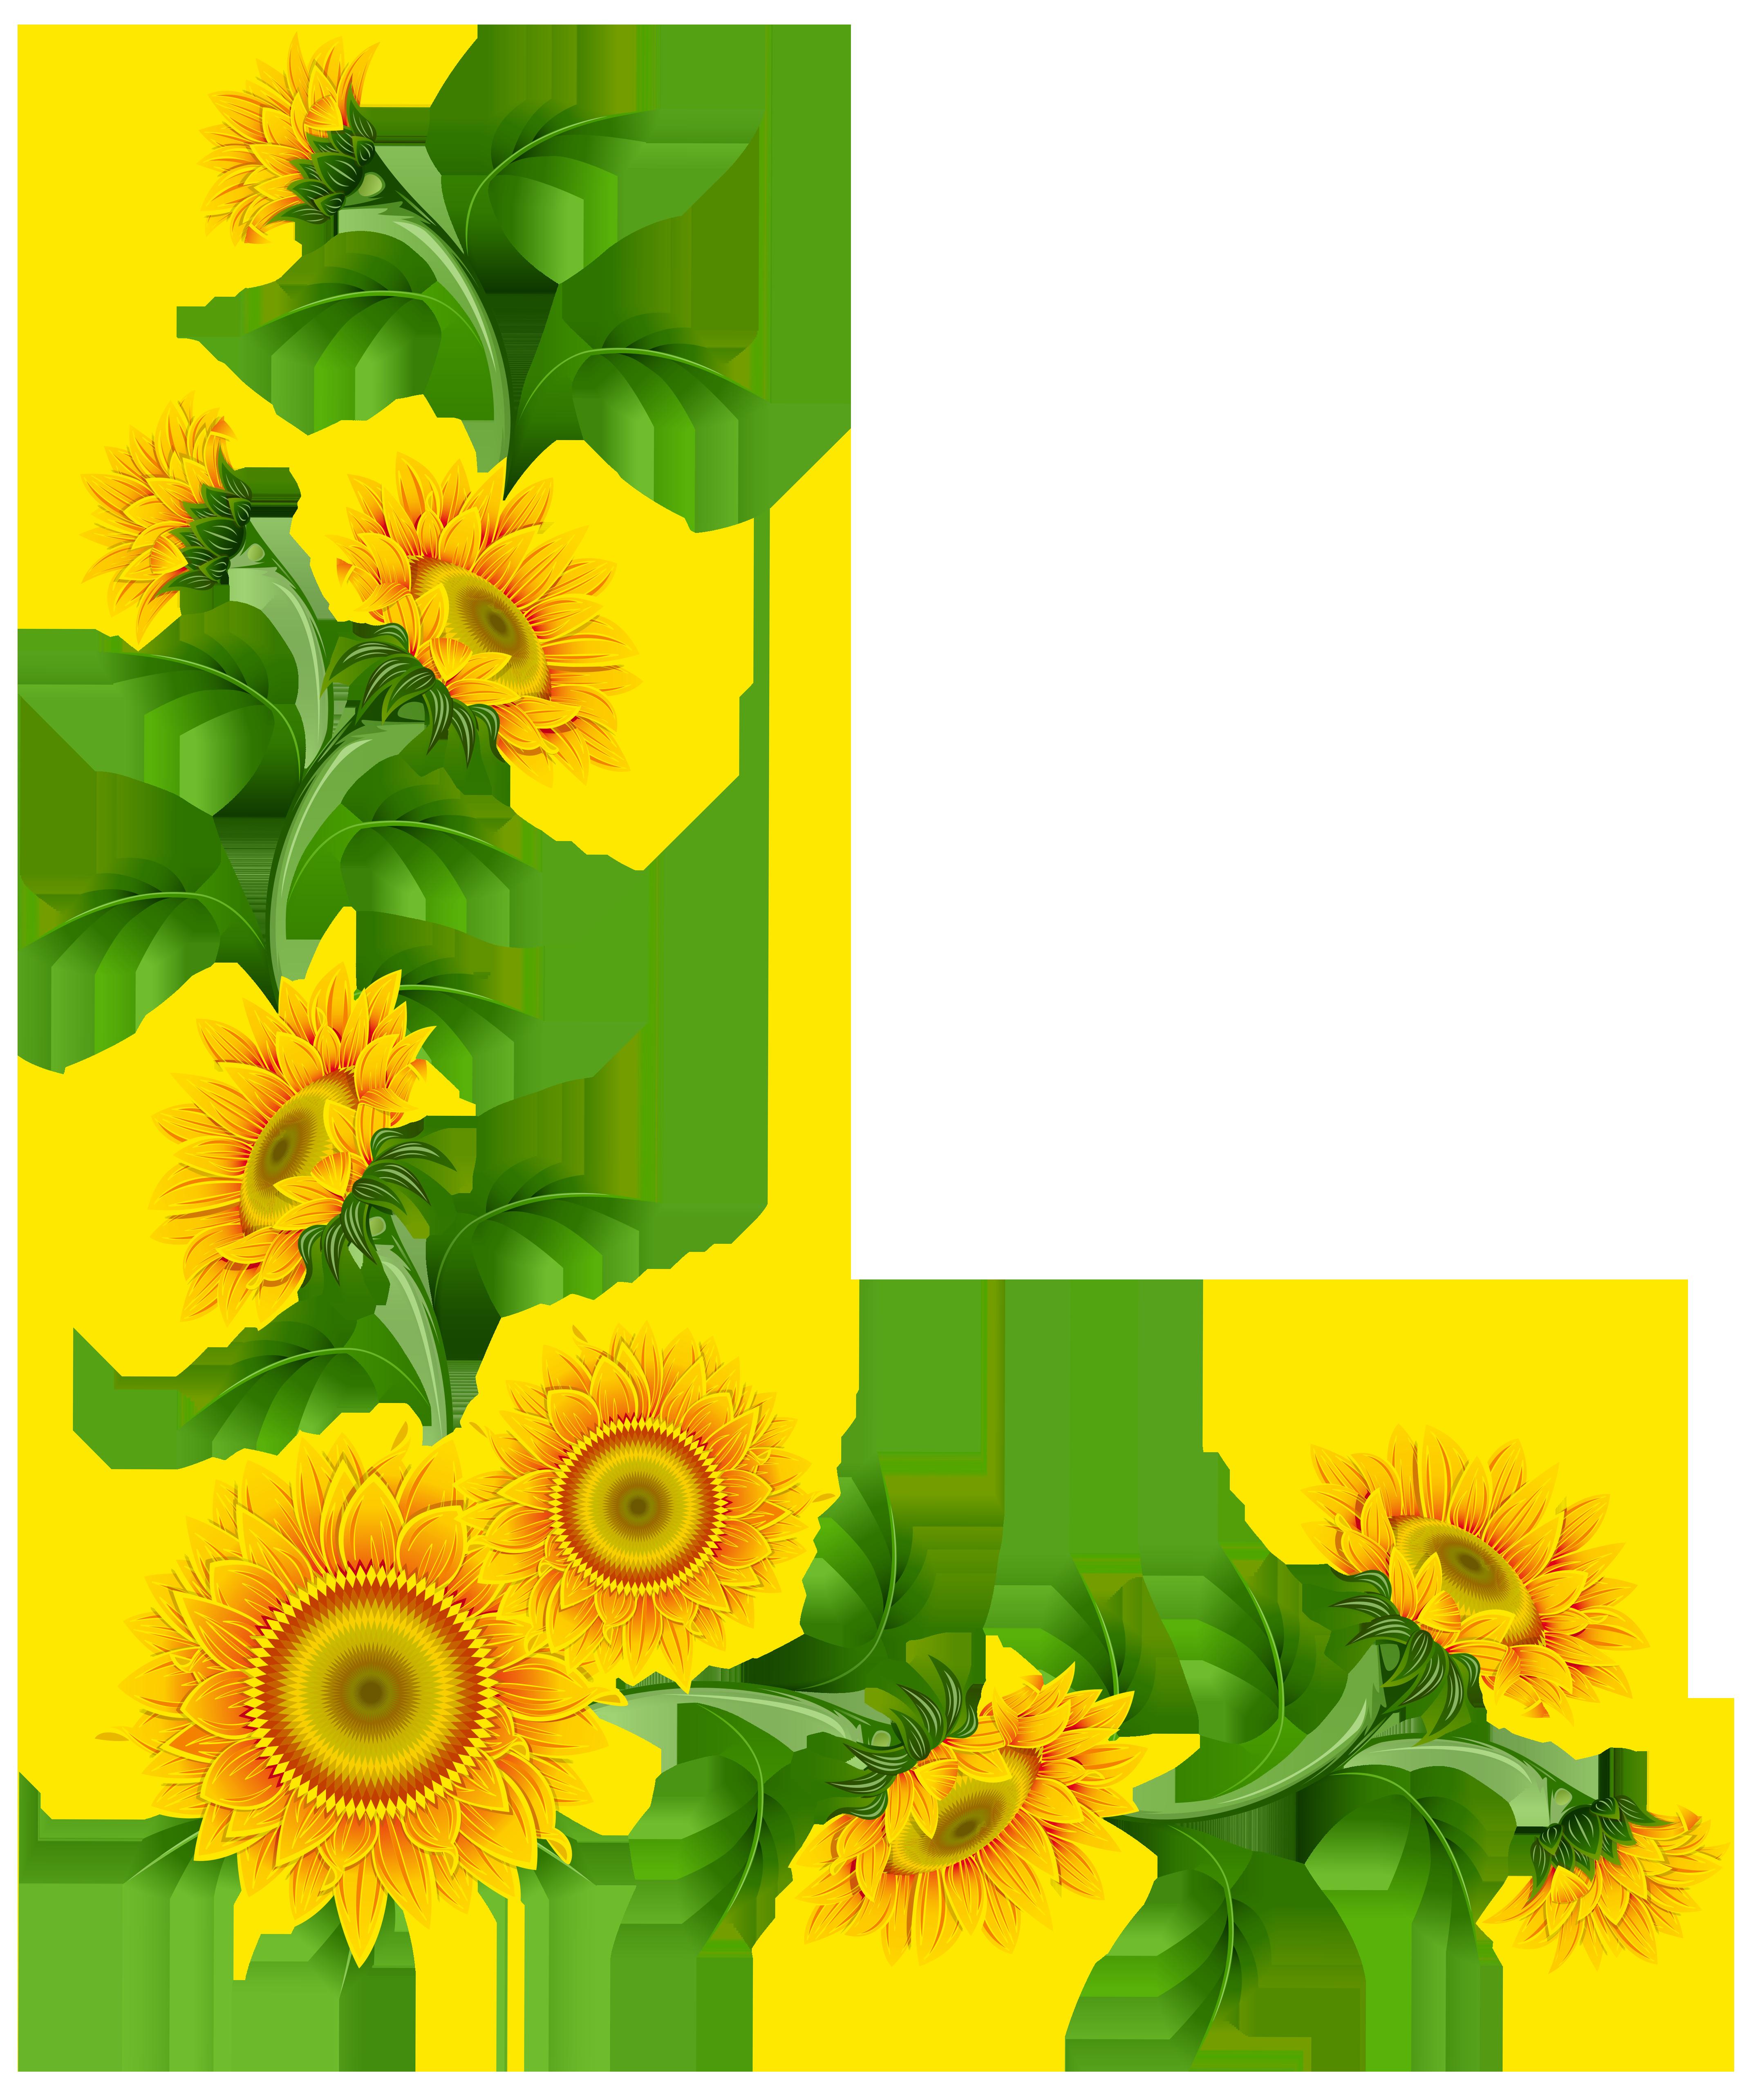 4316x5130 Sunflower Border Decoration Png Clipart Imageu200b Gallery